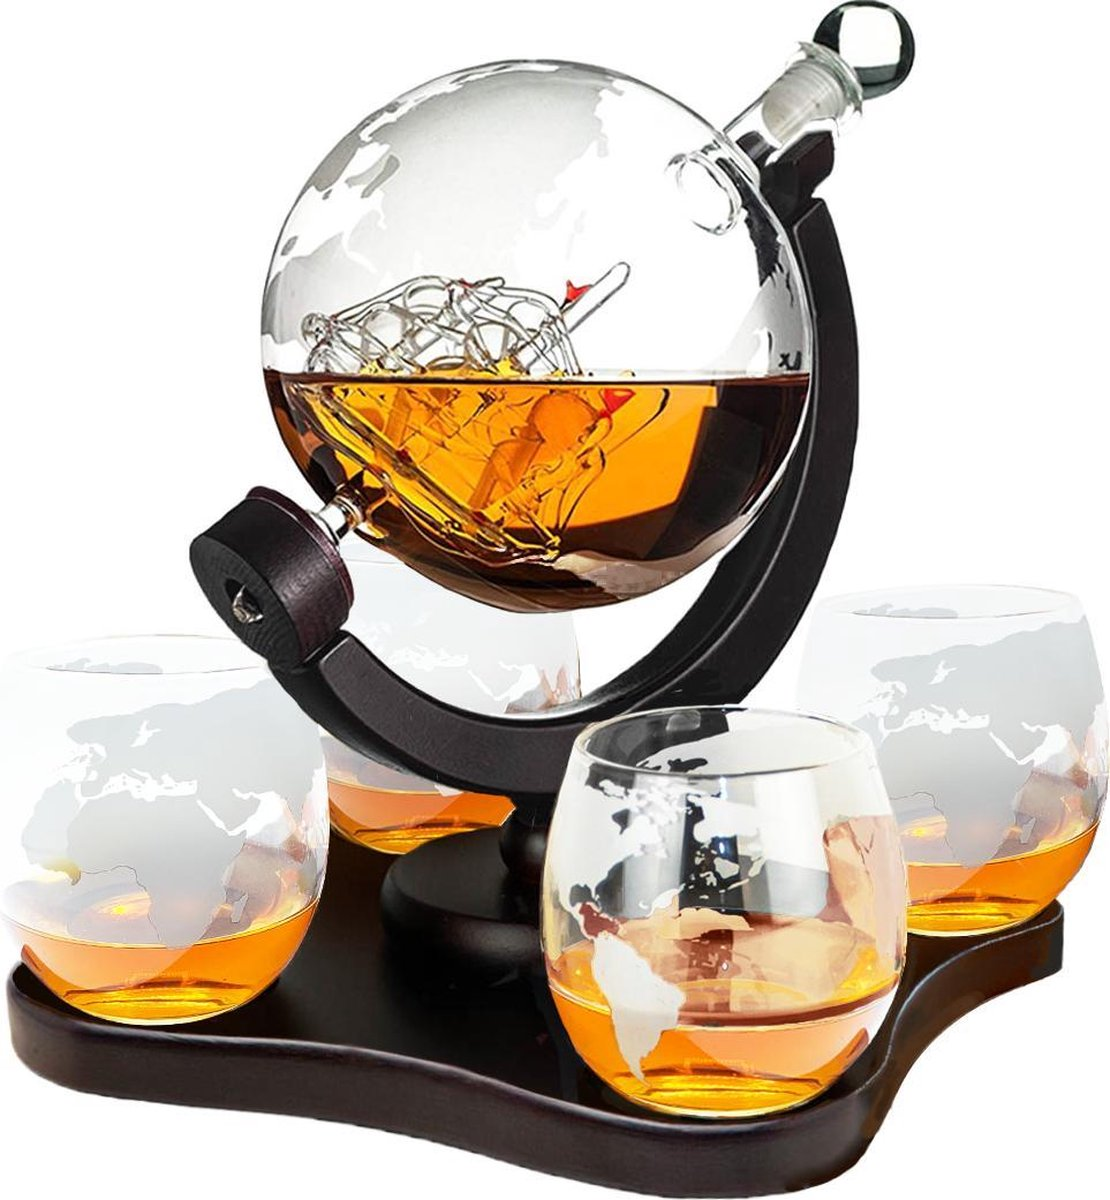 Whisiskey  Whiskey Karaf - Wereldbol - Luxe Whisky Karaf Set - Whiskey Set - 0,9 L - Decanteer Karaf